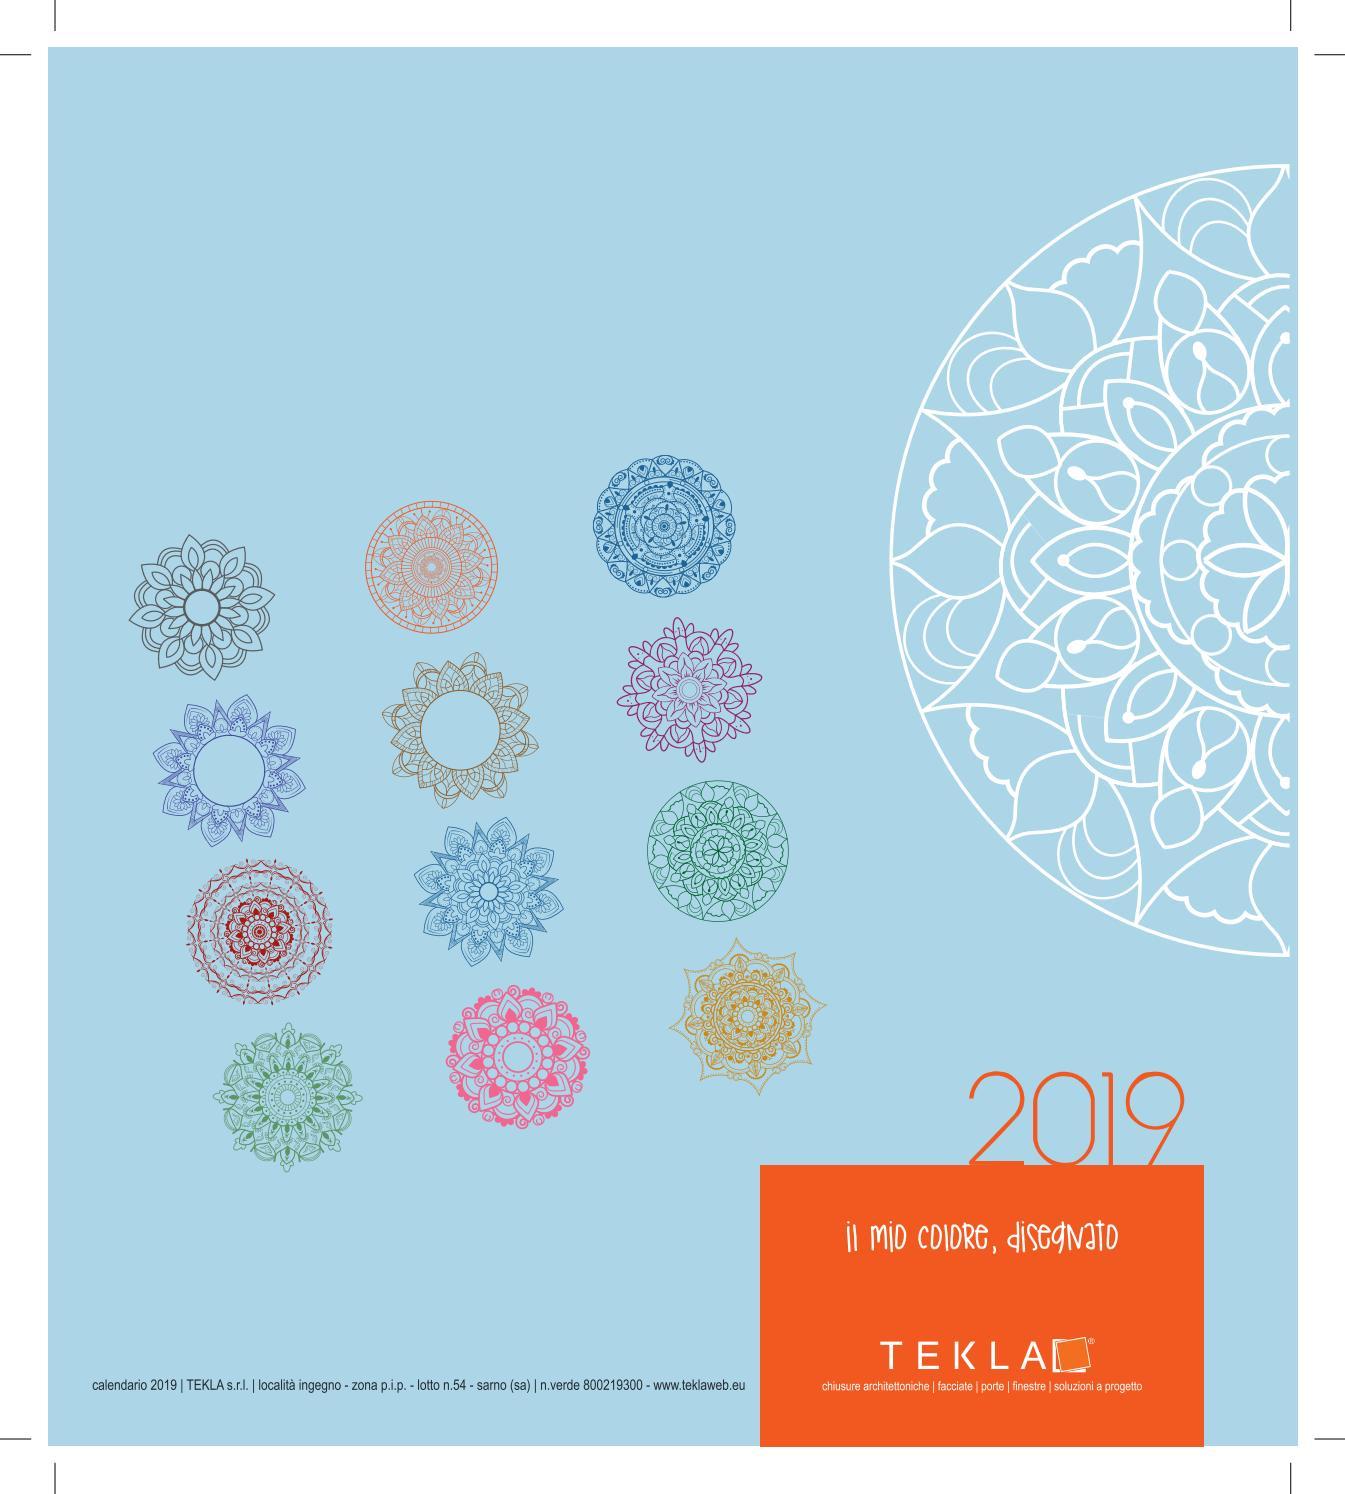 Tekla Porte E Finestre calendario tekla 2019 by tekla porte e finestre - issuu